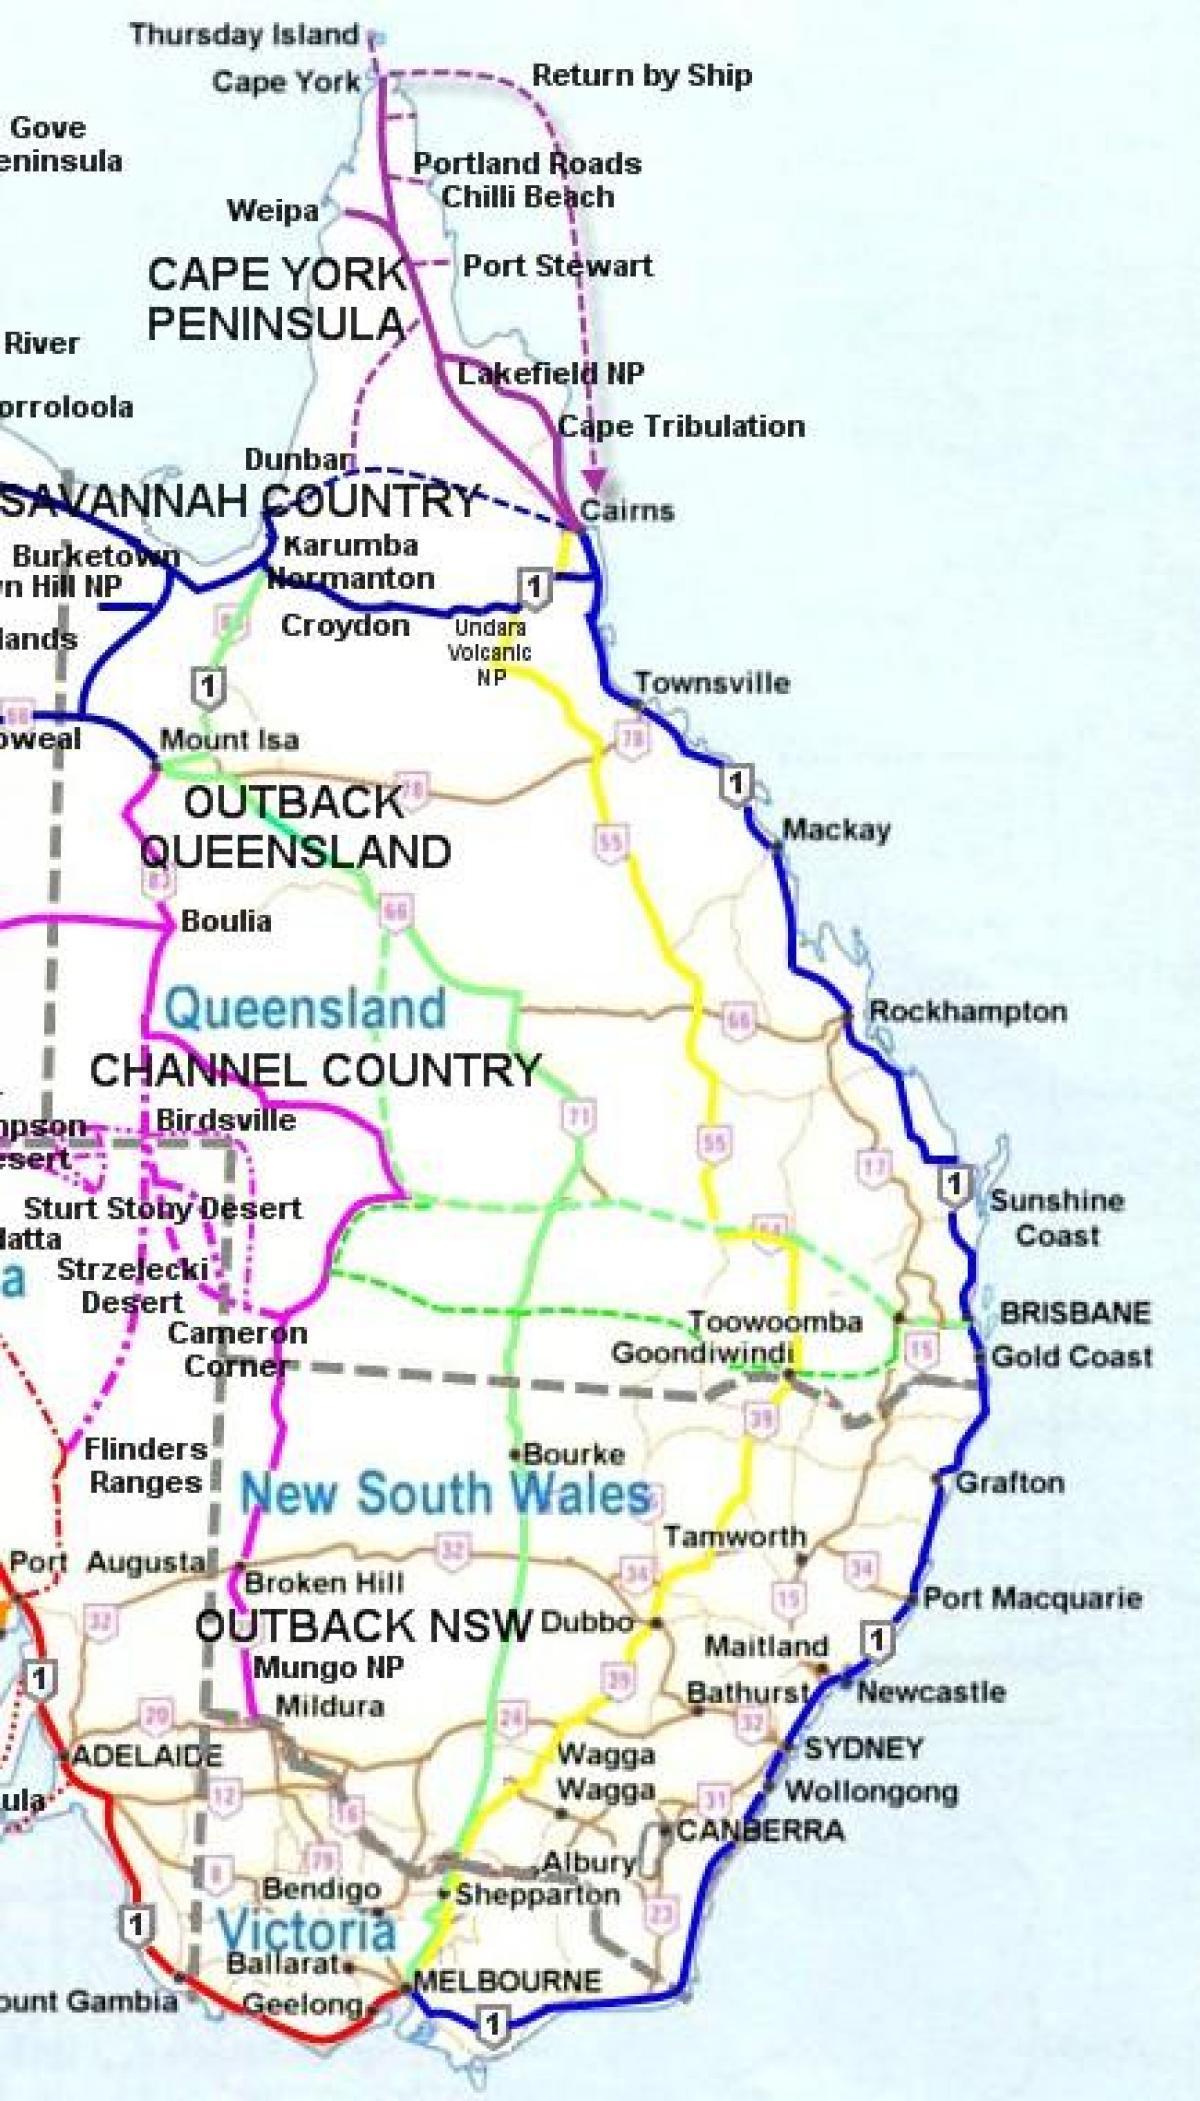 mapa da costa leste de australia